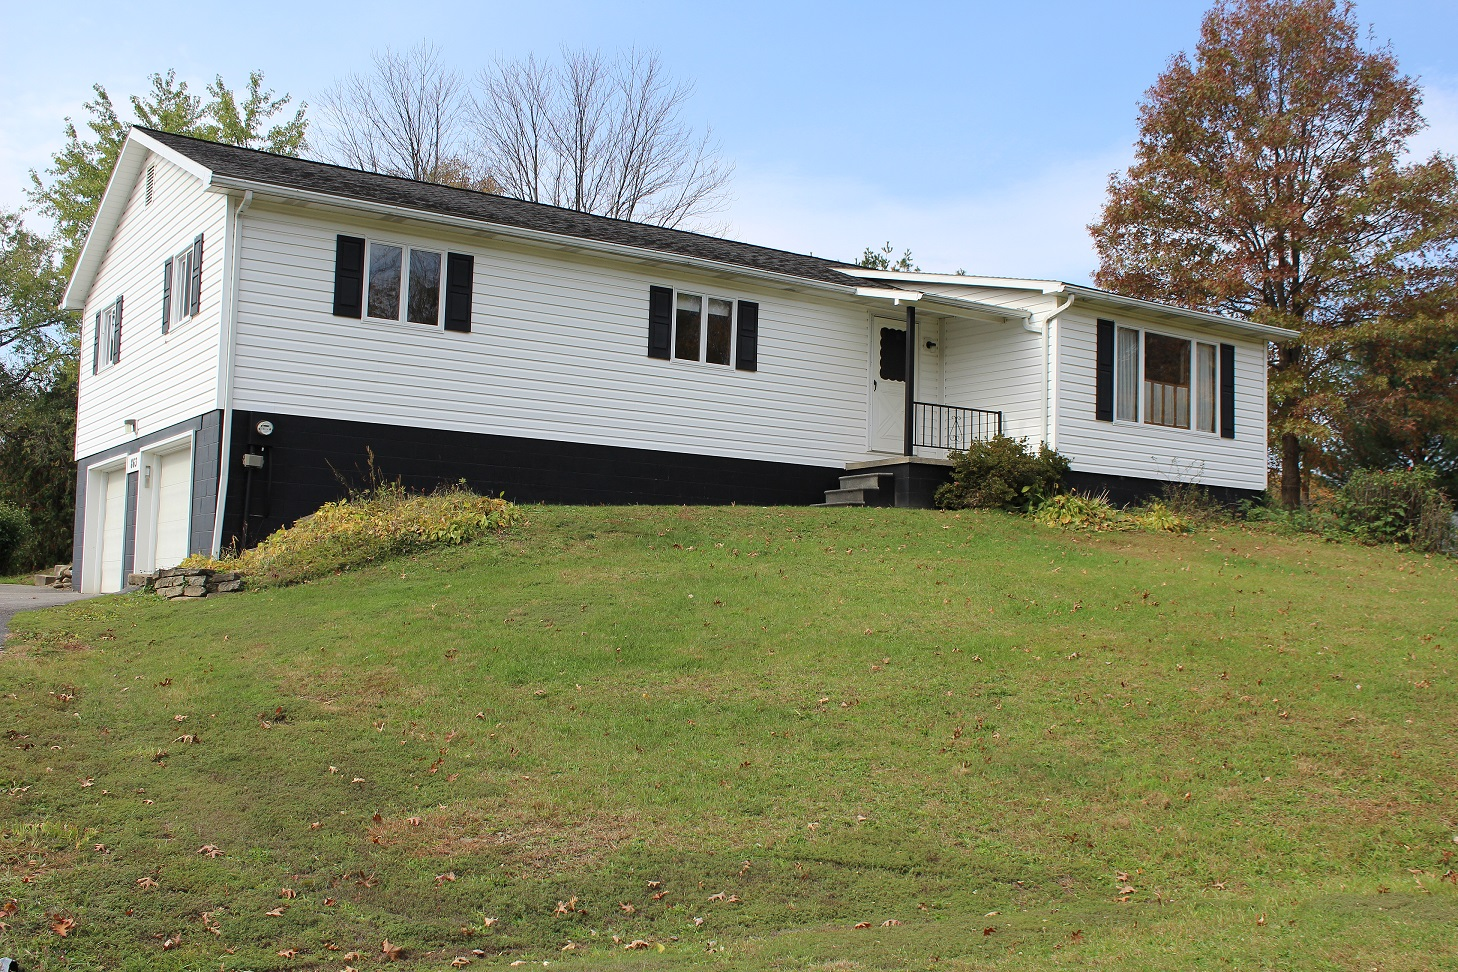 863 Campbell Rd, Tyrone, Pennsylvania 16686